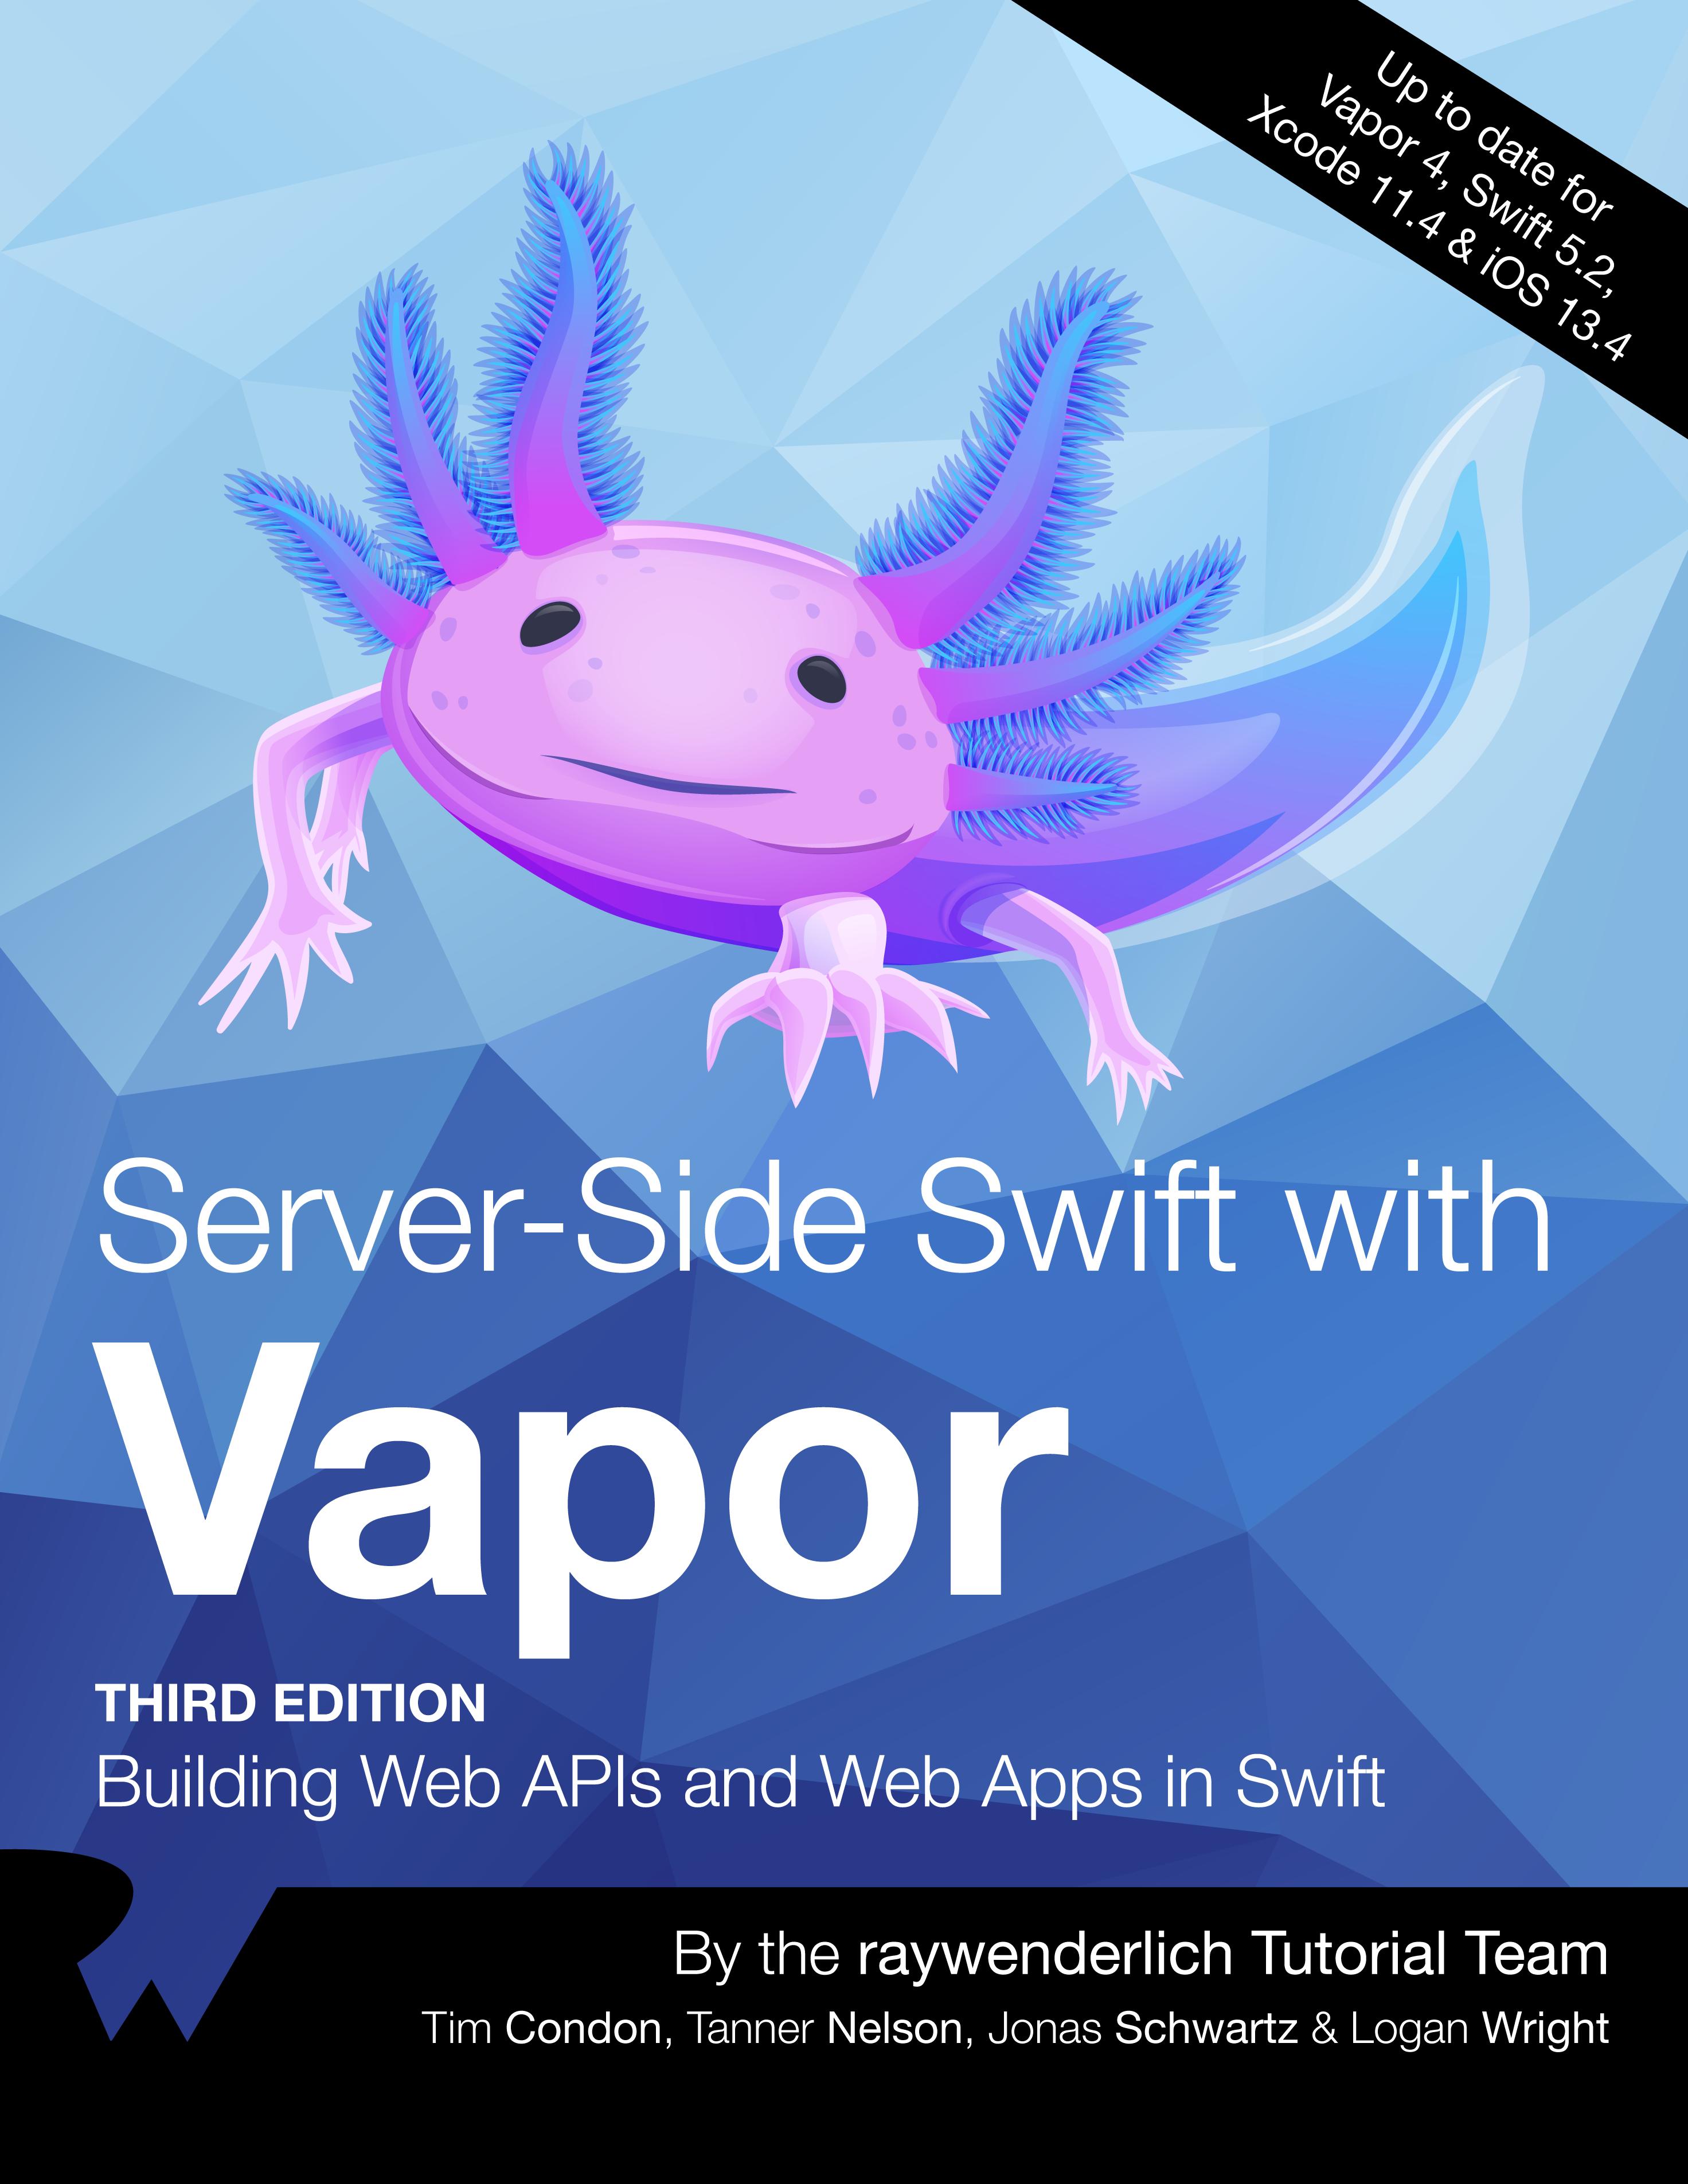 Server-Side Swift with Vapor